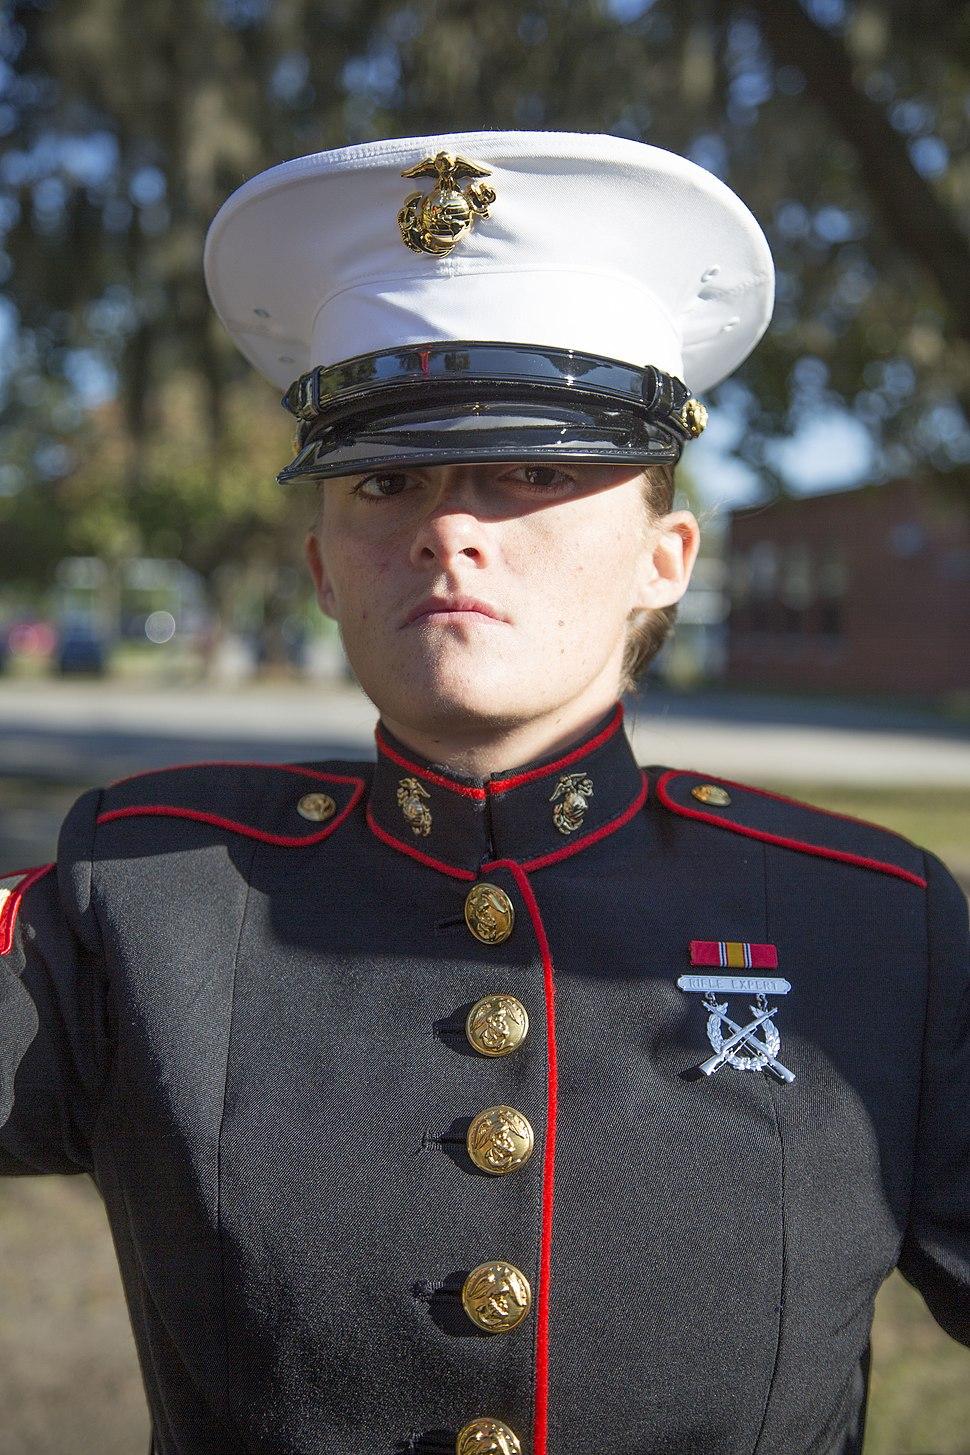 Marine dress blues